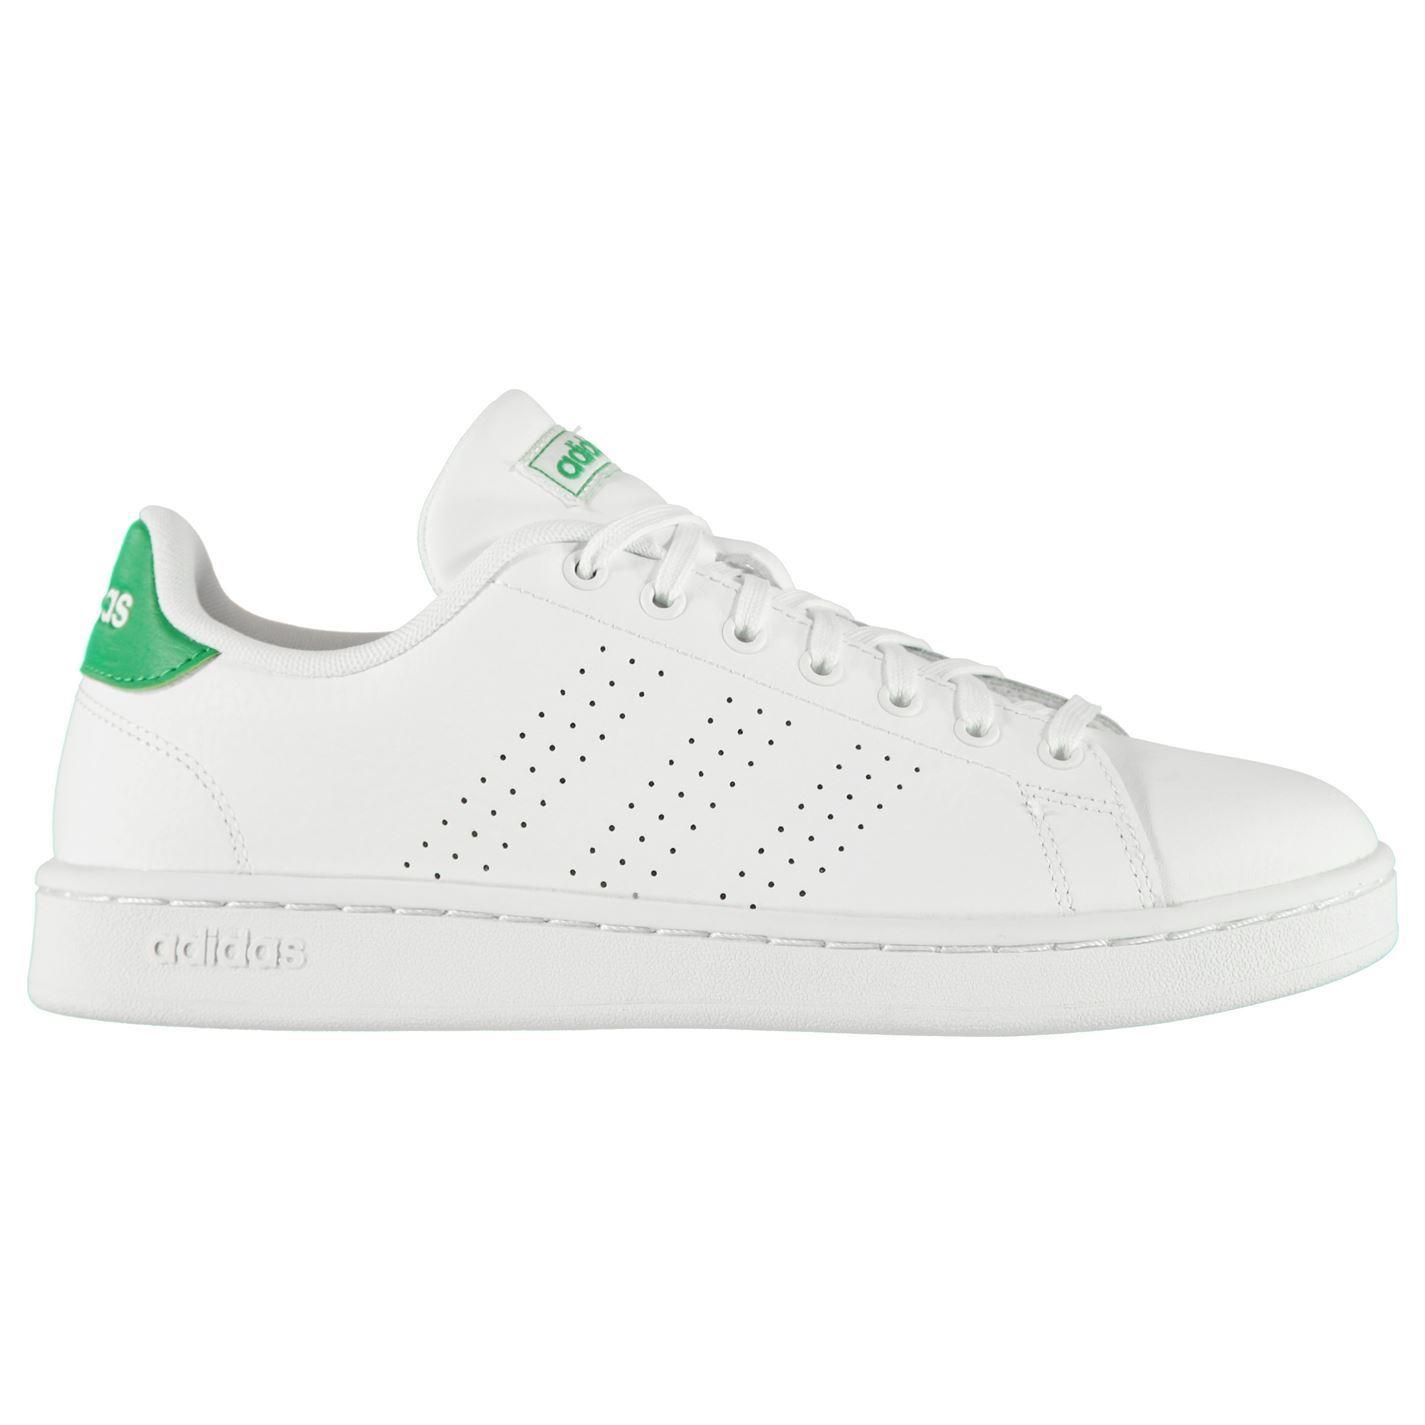 Adidas-Advantage-Baskets-Homme-Chaussures-De-Loisirs-Chaussures-Baskets miniature 5